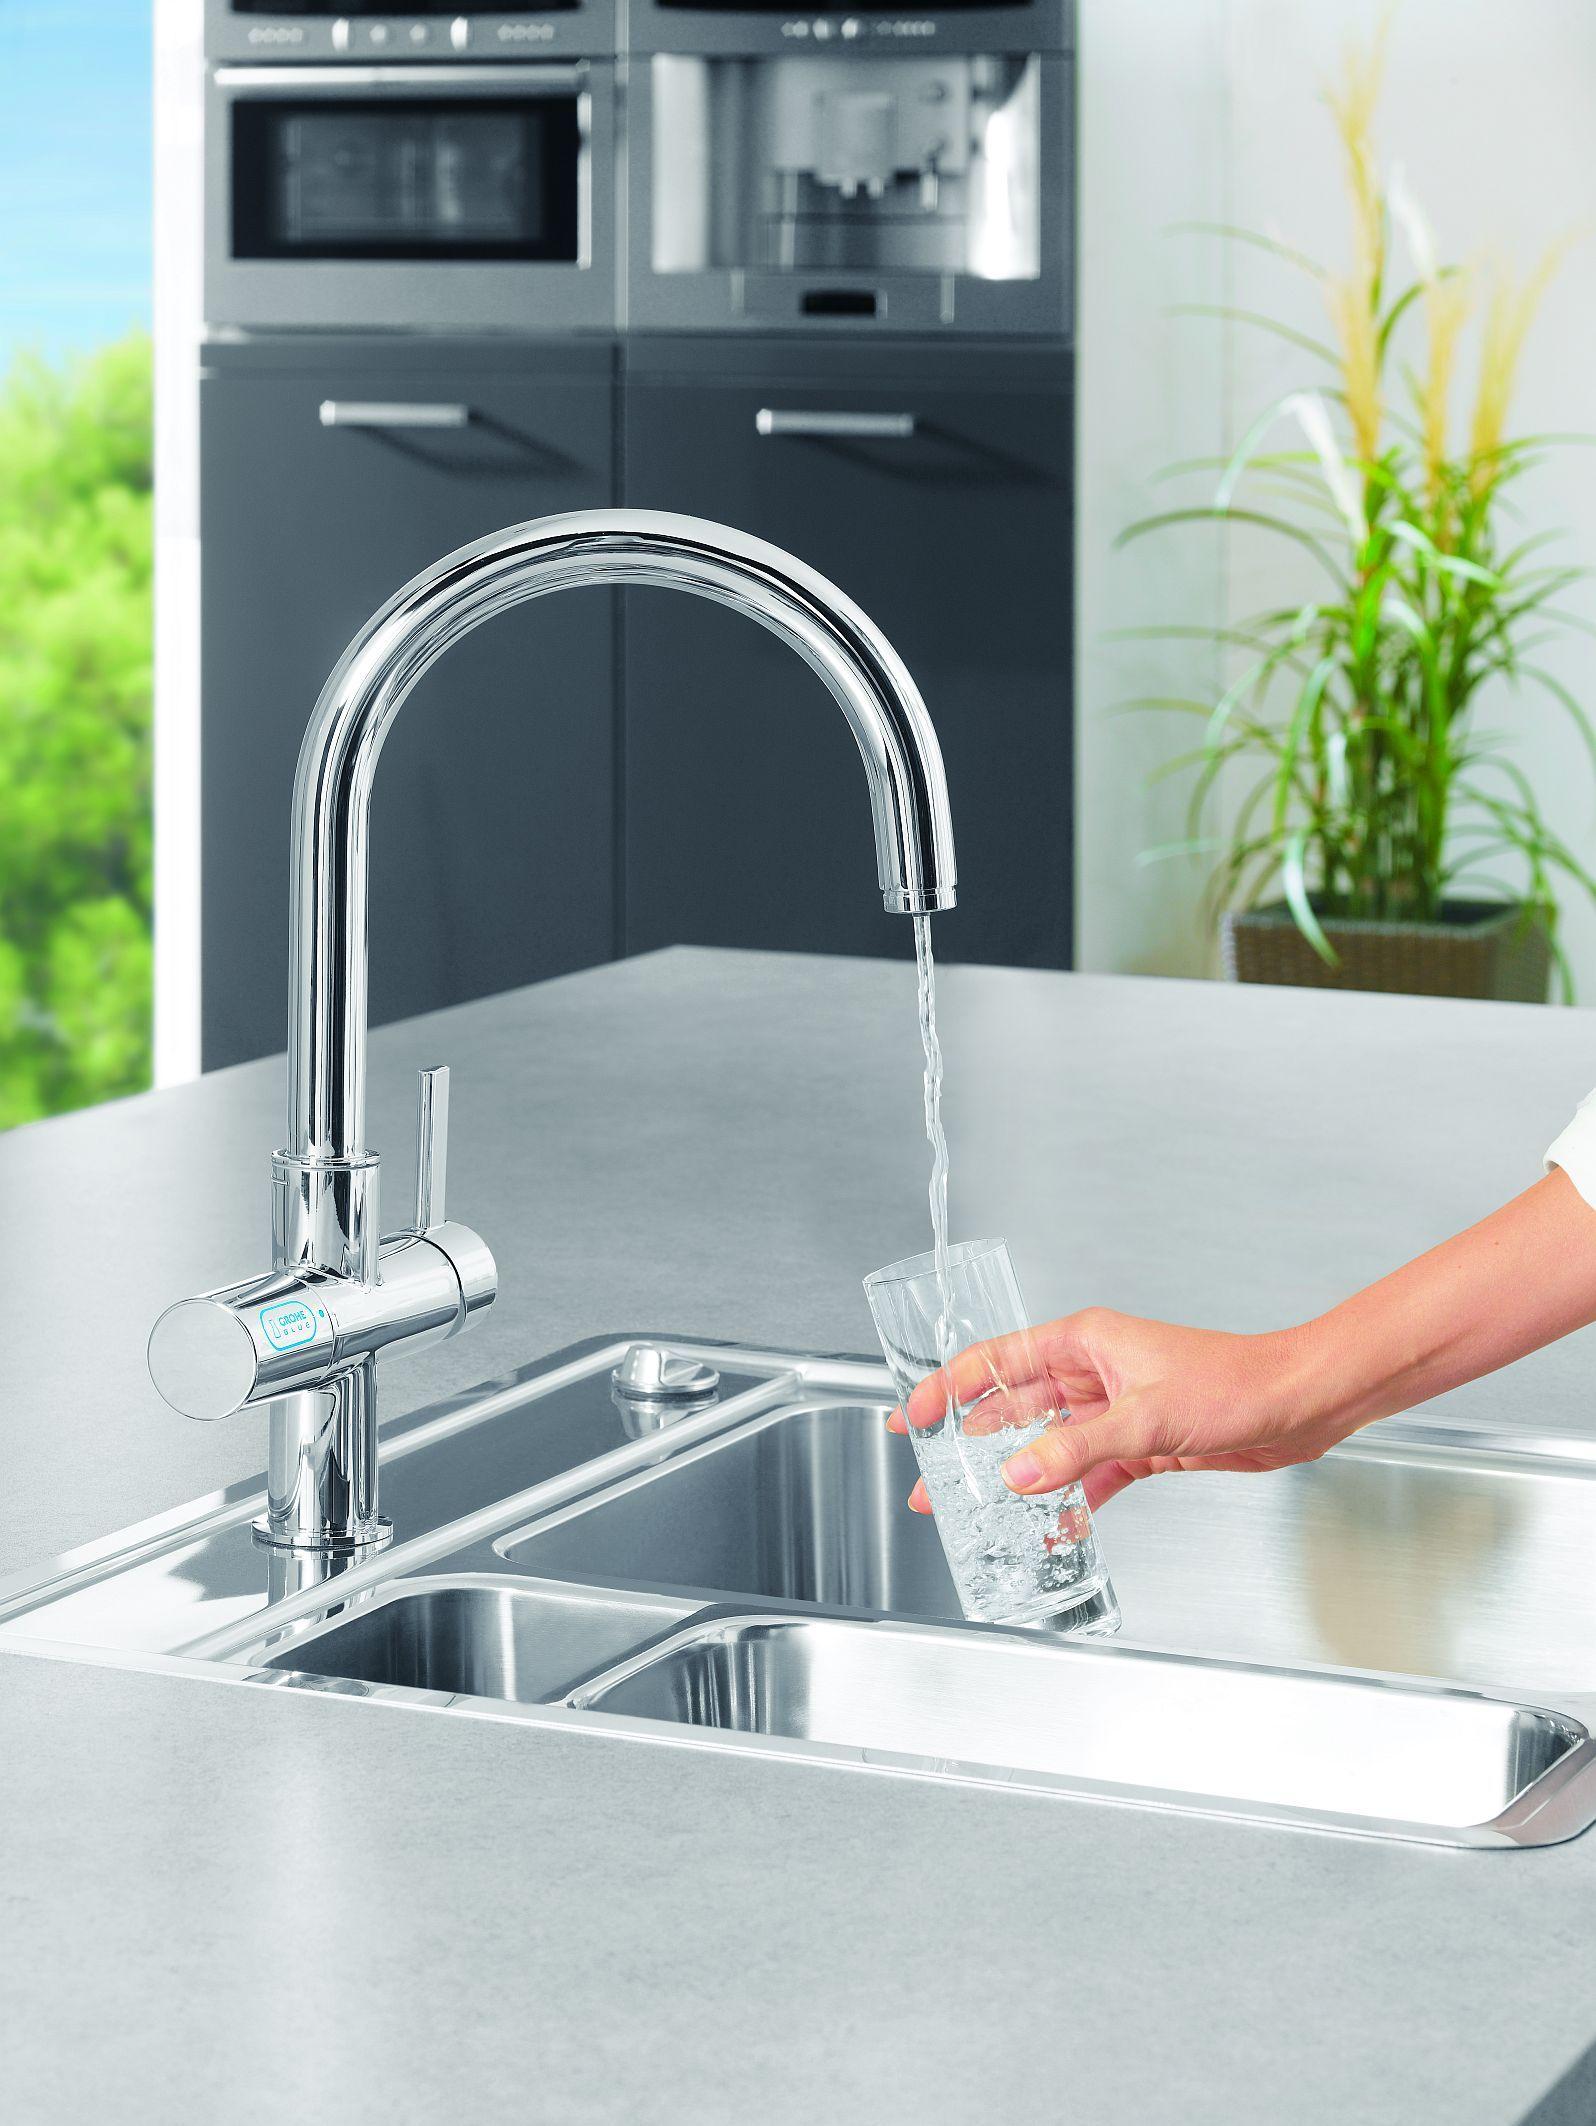 GROHE Blue ® : The pure refreshment. | My dream kitchen | Pinterest ...